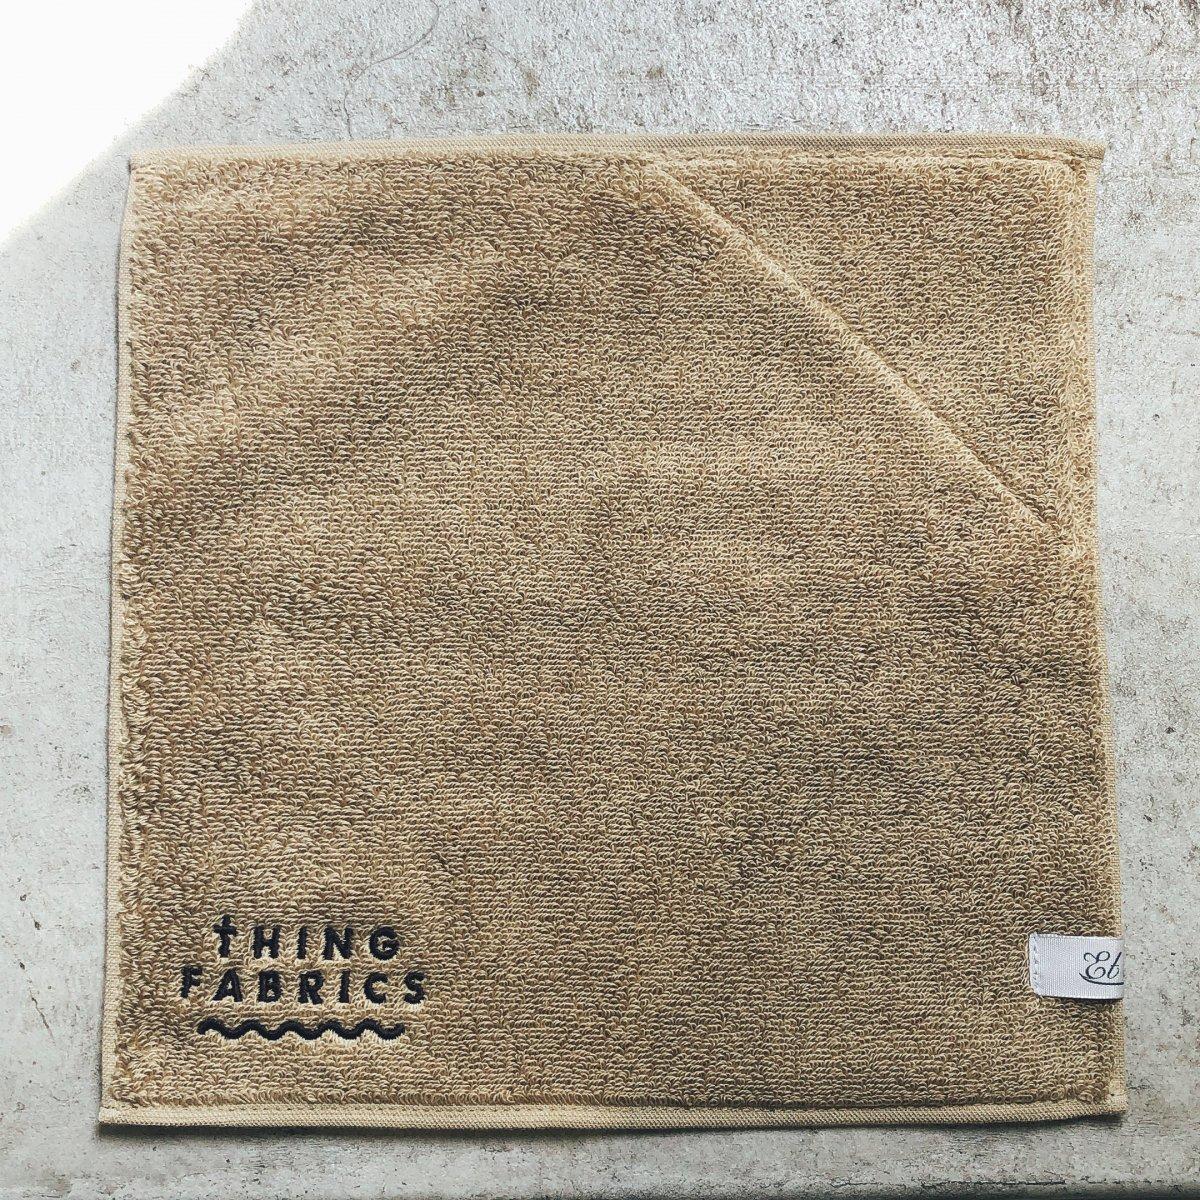 Et baas × THING FABRICS Pile HAND TOWL 詳細画像1